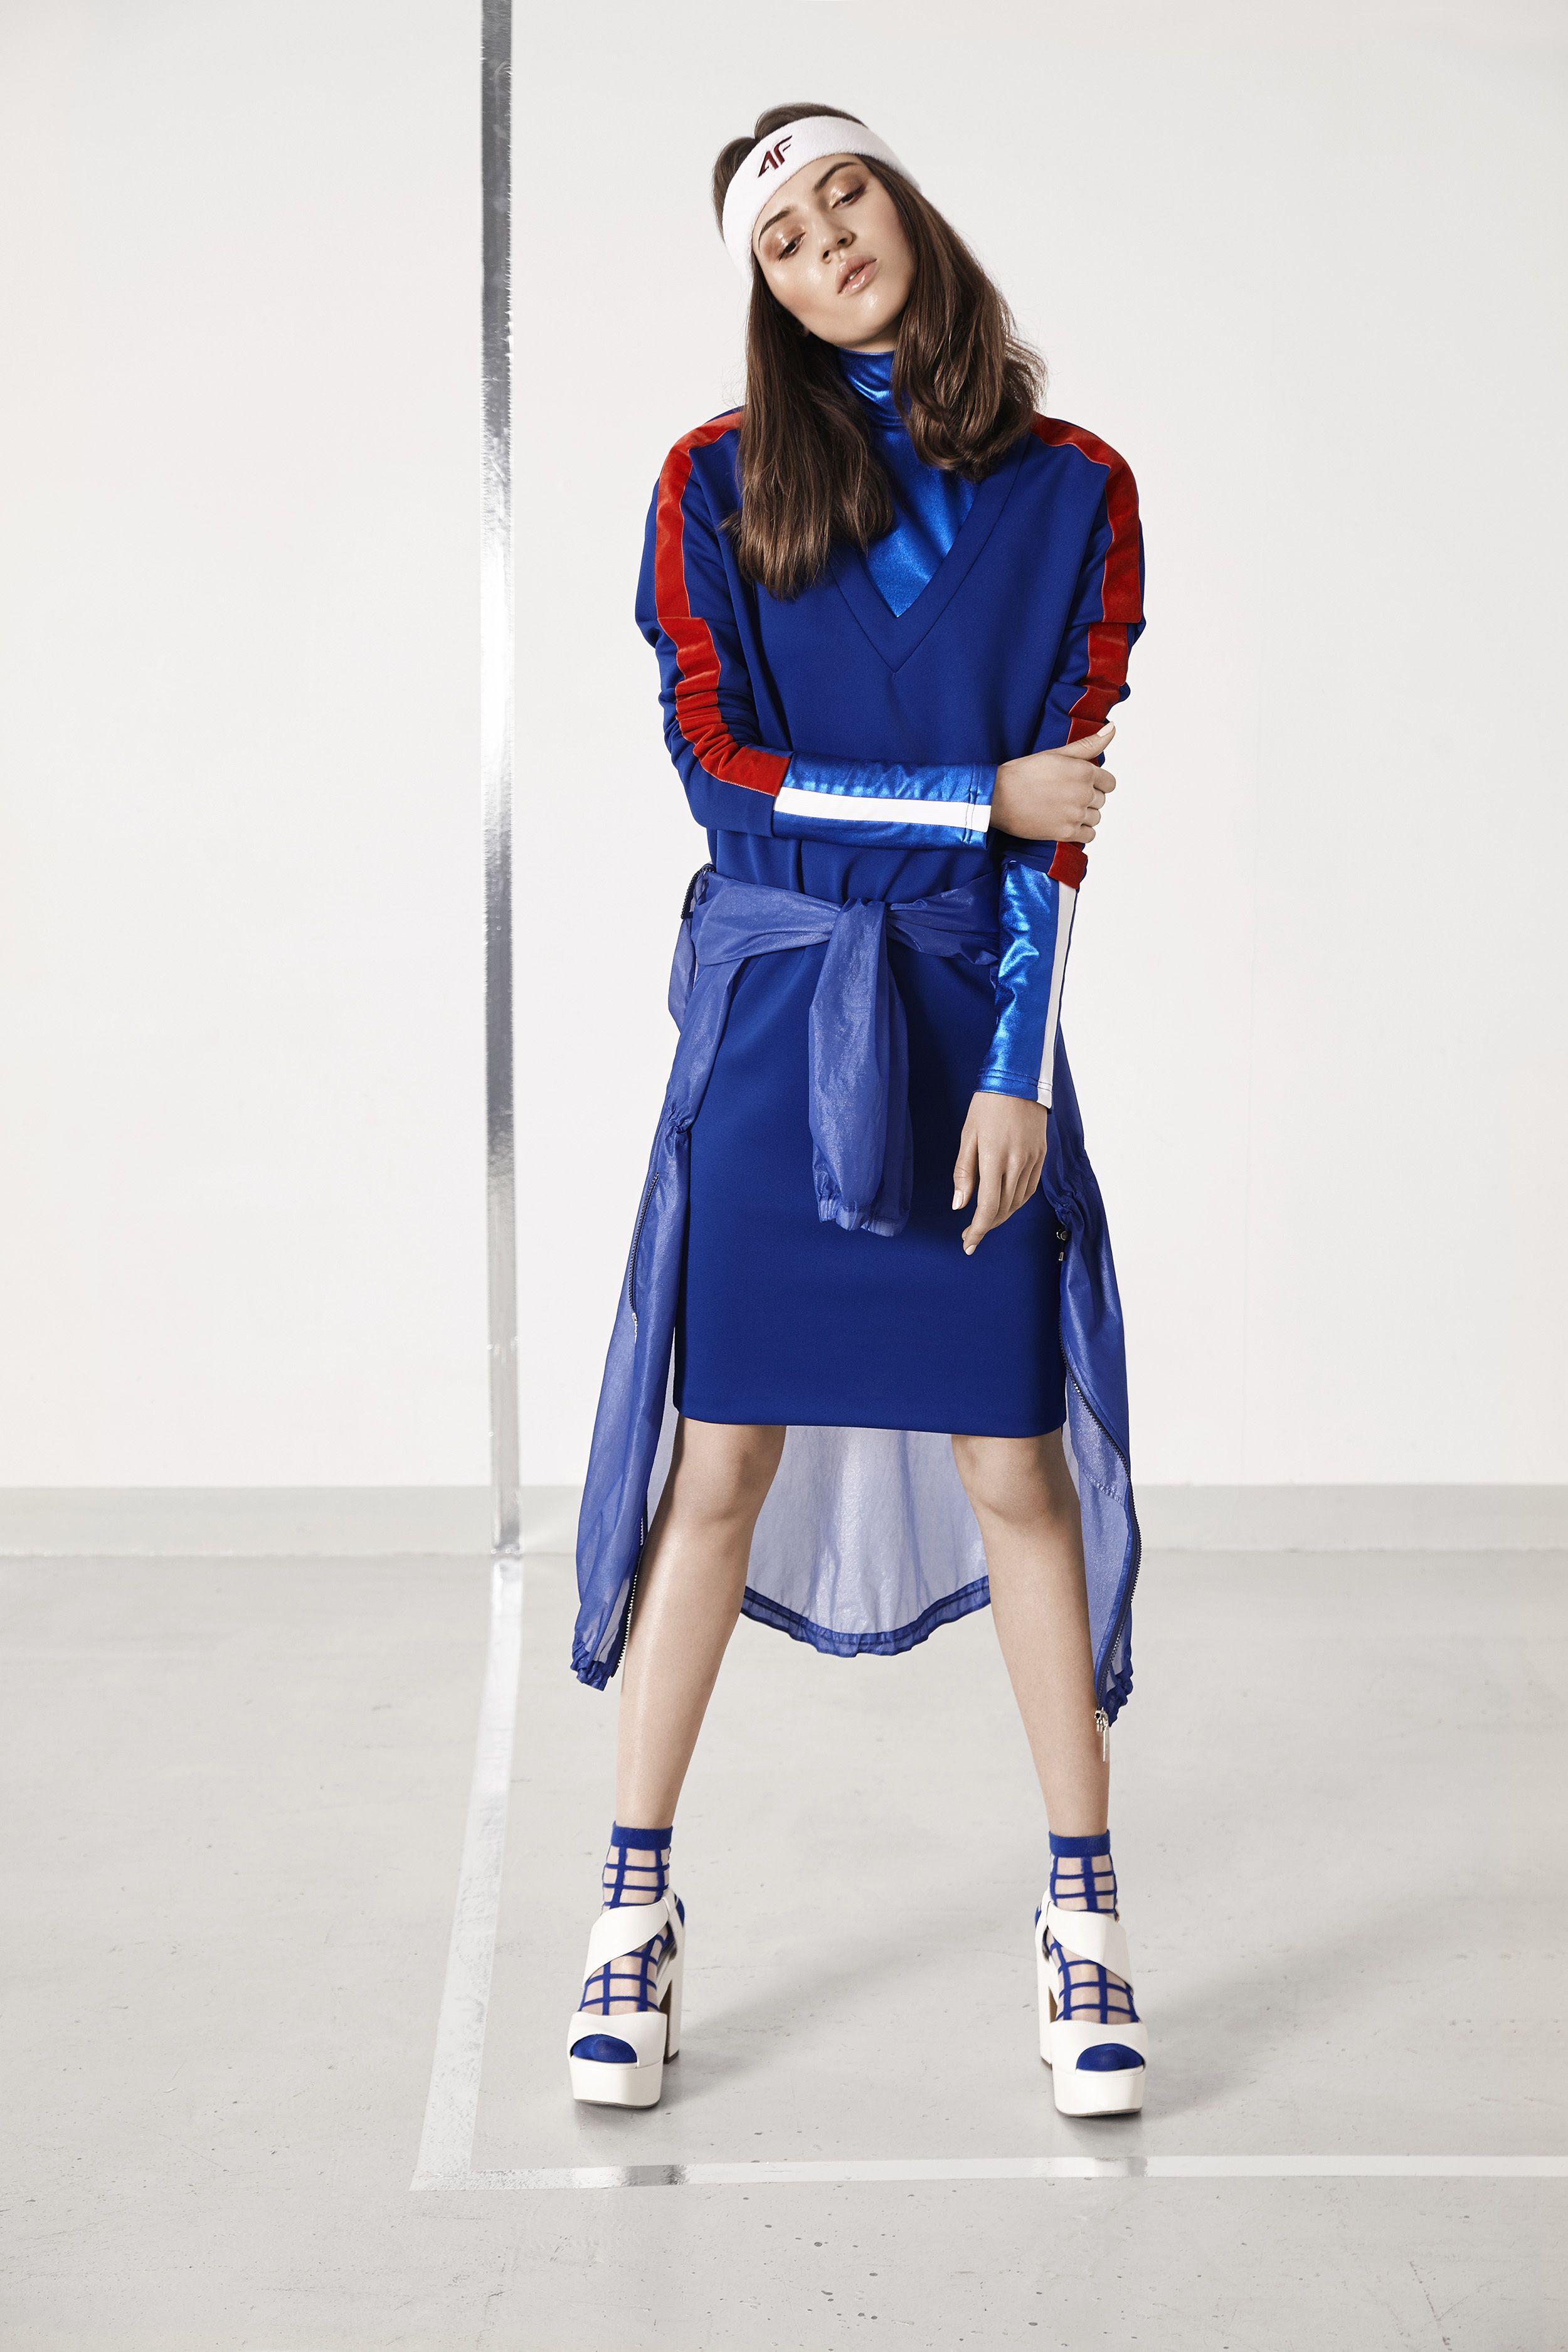 Sesja Wizerunkowa Ss17 Ranita Sobanska Fashion Shirt Dress Retro Sport